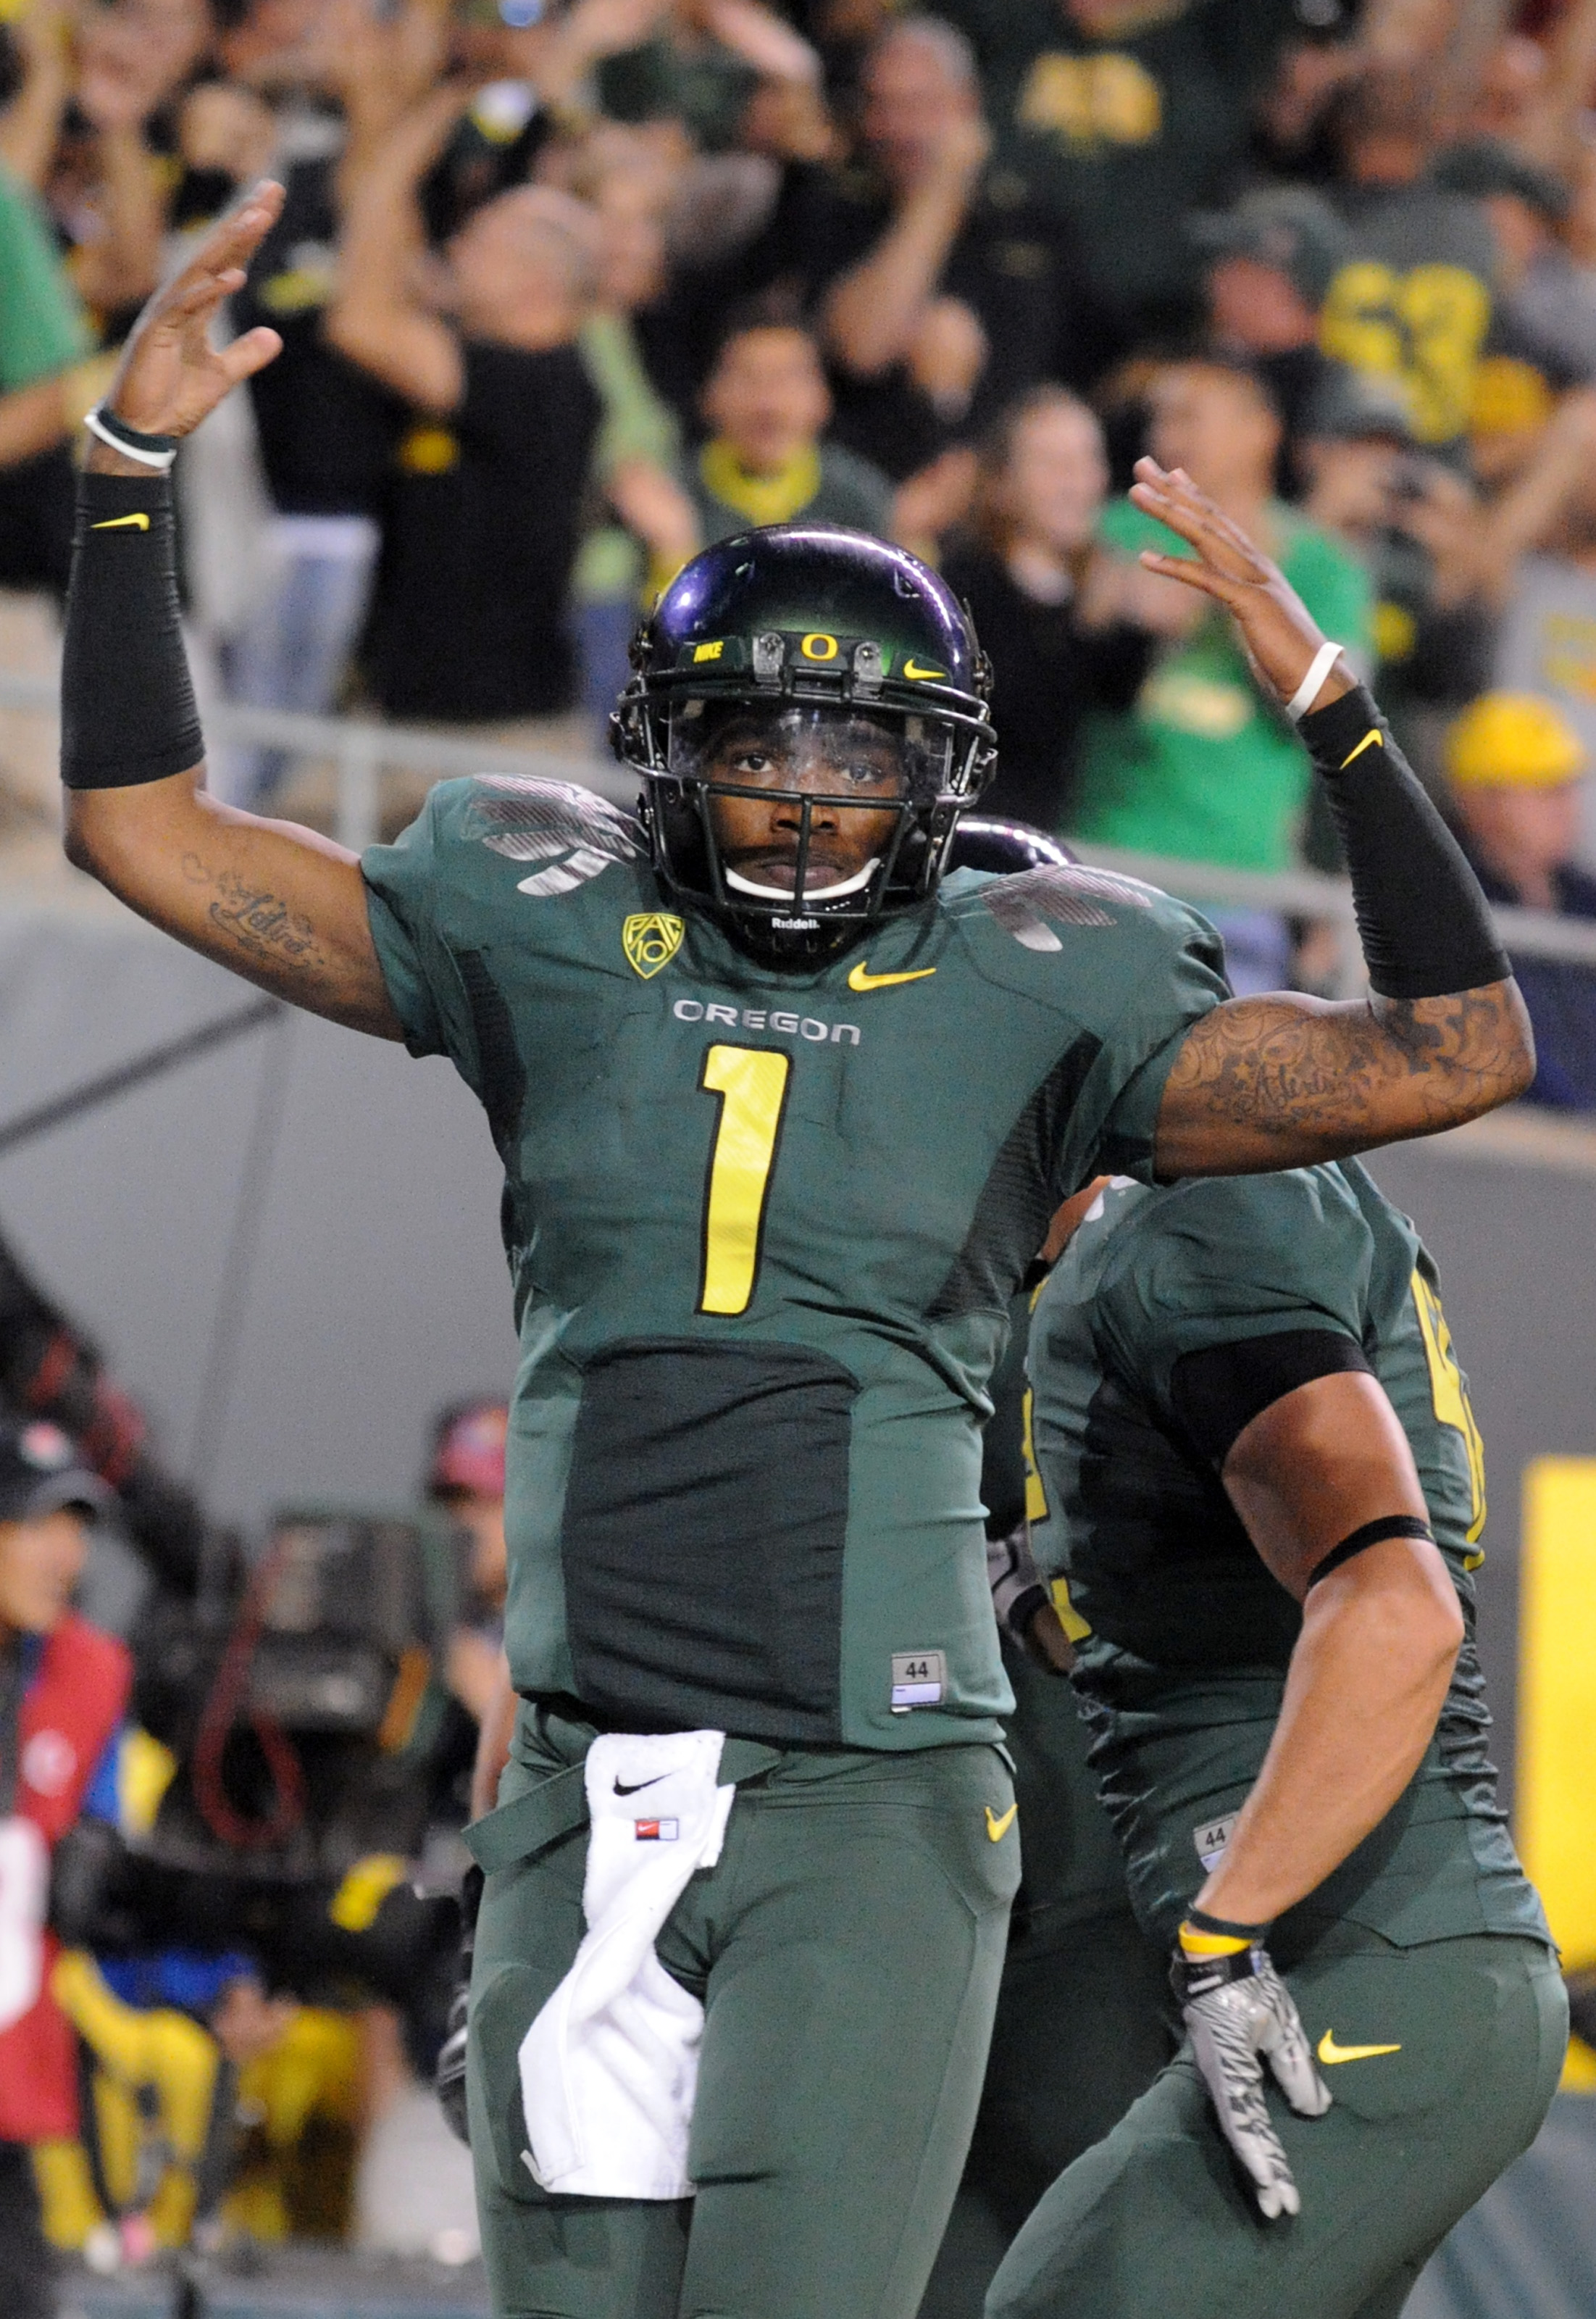 Darron Thomas in one of the 5 billion Oregon uniforms.